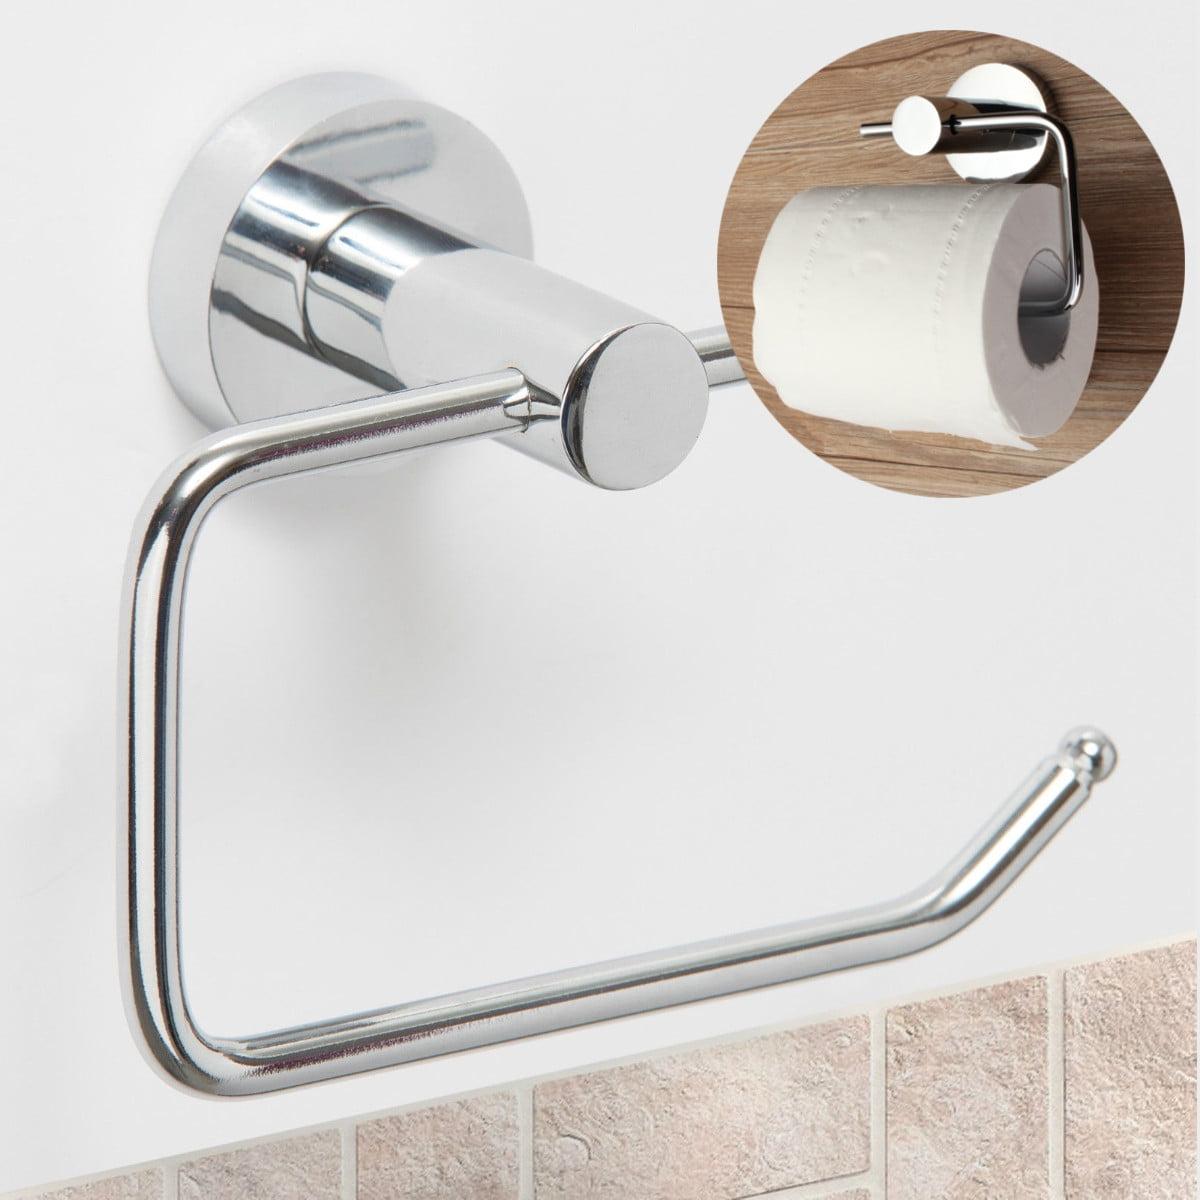 Toilet Paper Holder Storage Stainless Steel Bathroom Kitchen Paper Towel Dispenser Tissue Roll Hanger Wall Mount... by